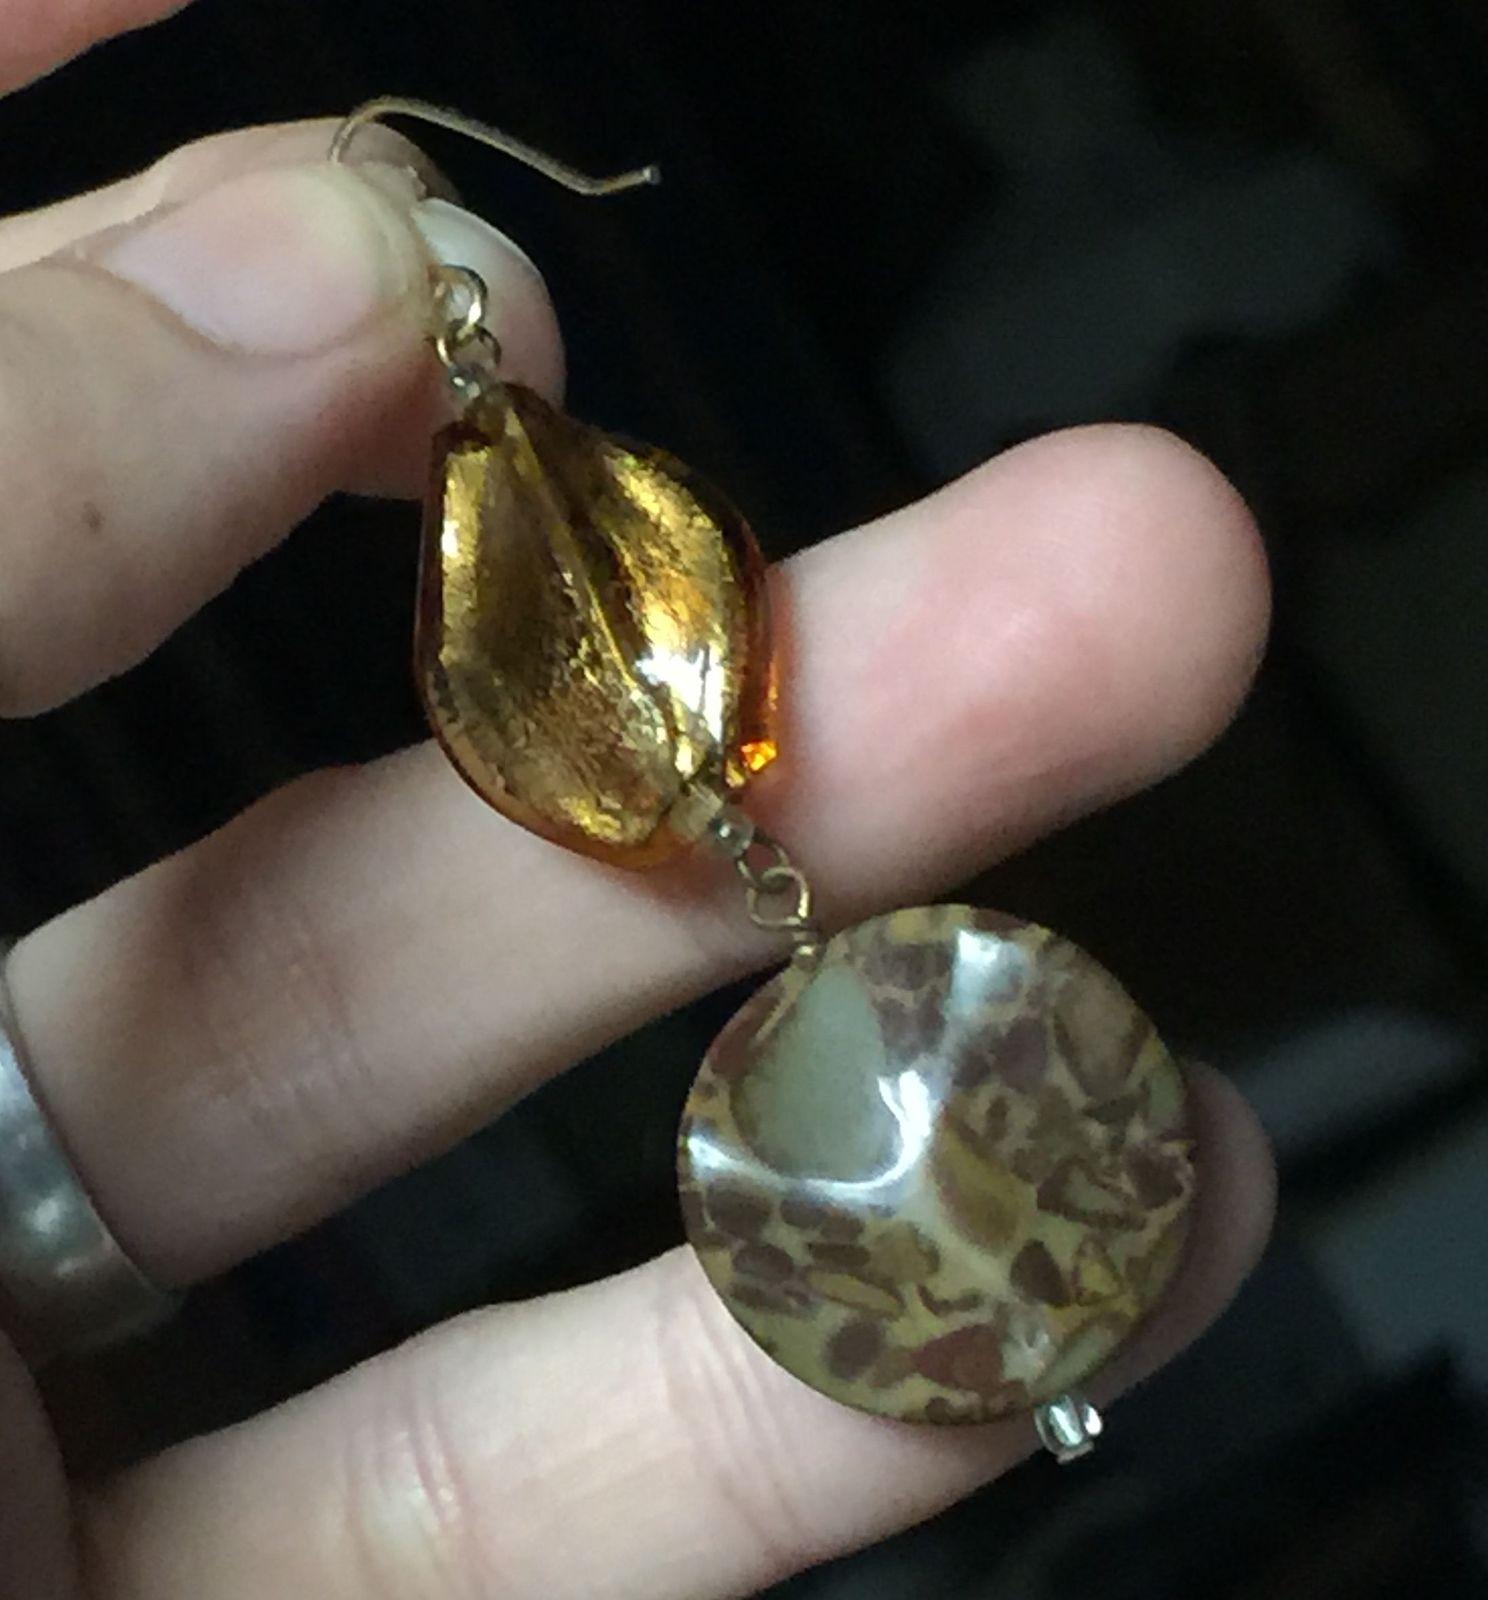 VTG Gold Metallic Brown Marble Look Plastic Beads Long Dangling Pierced Earrings image 4